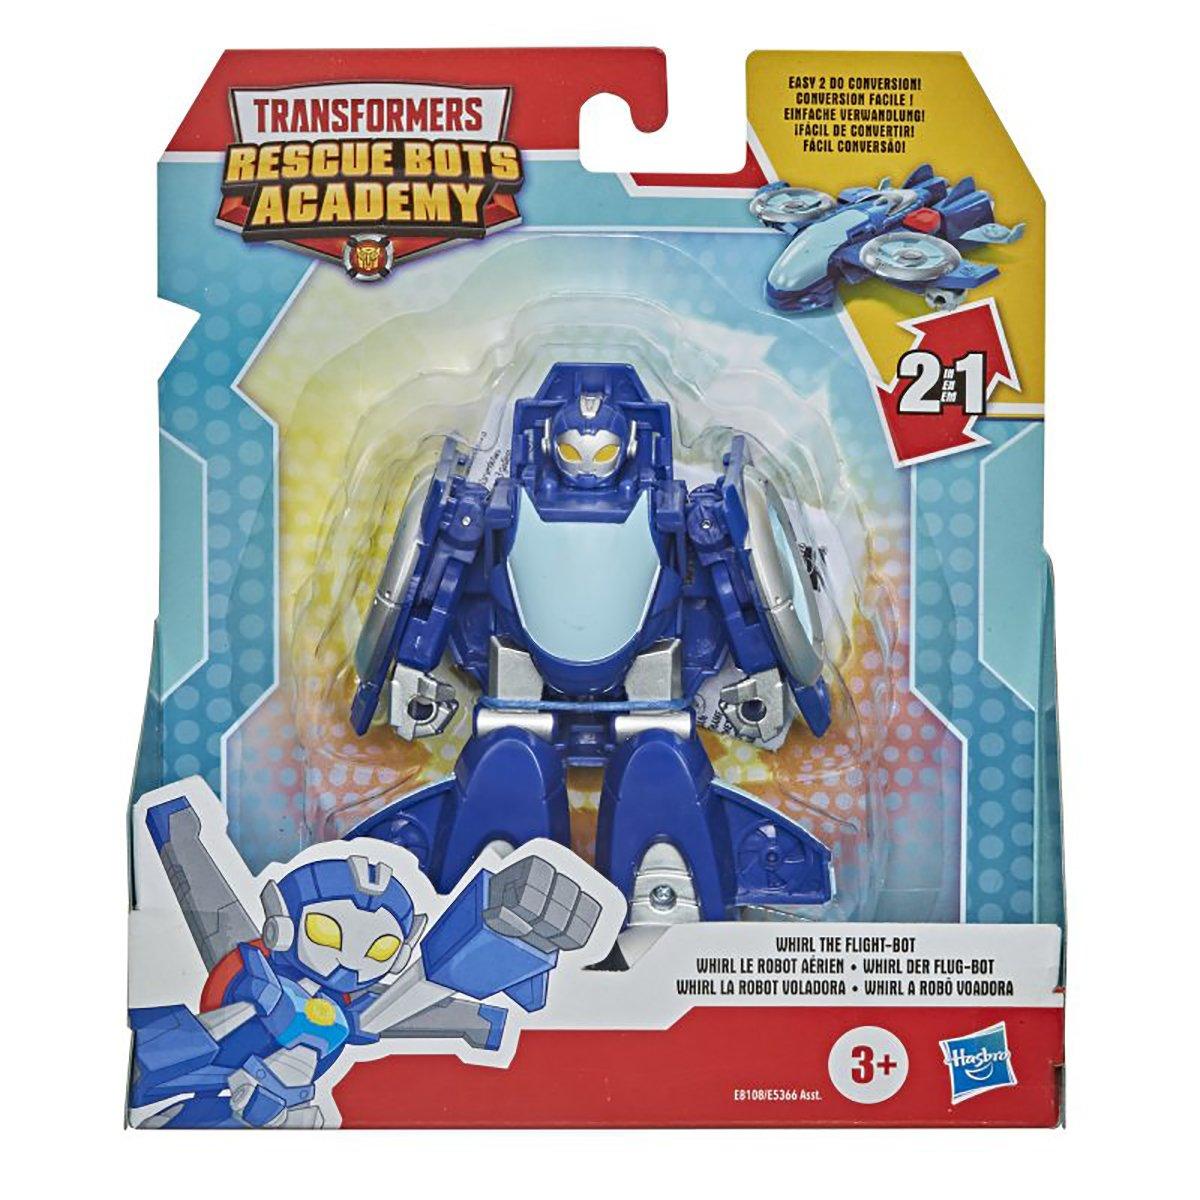 Figurina Transformers Rescue Bots Academy, Whirl The Flight, E8108